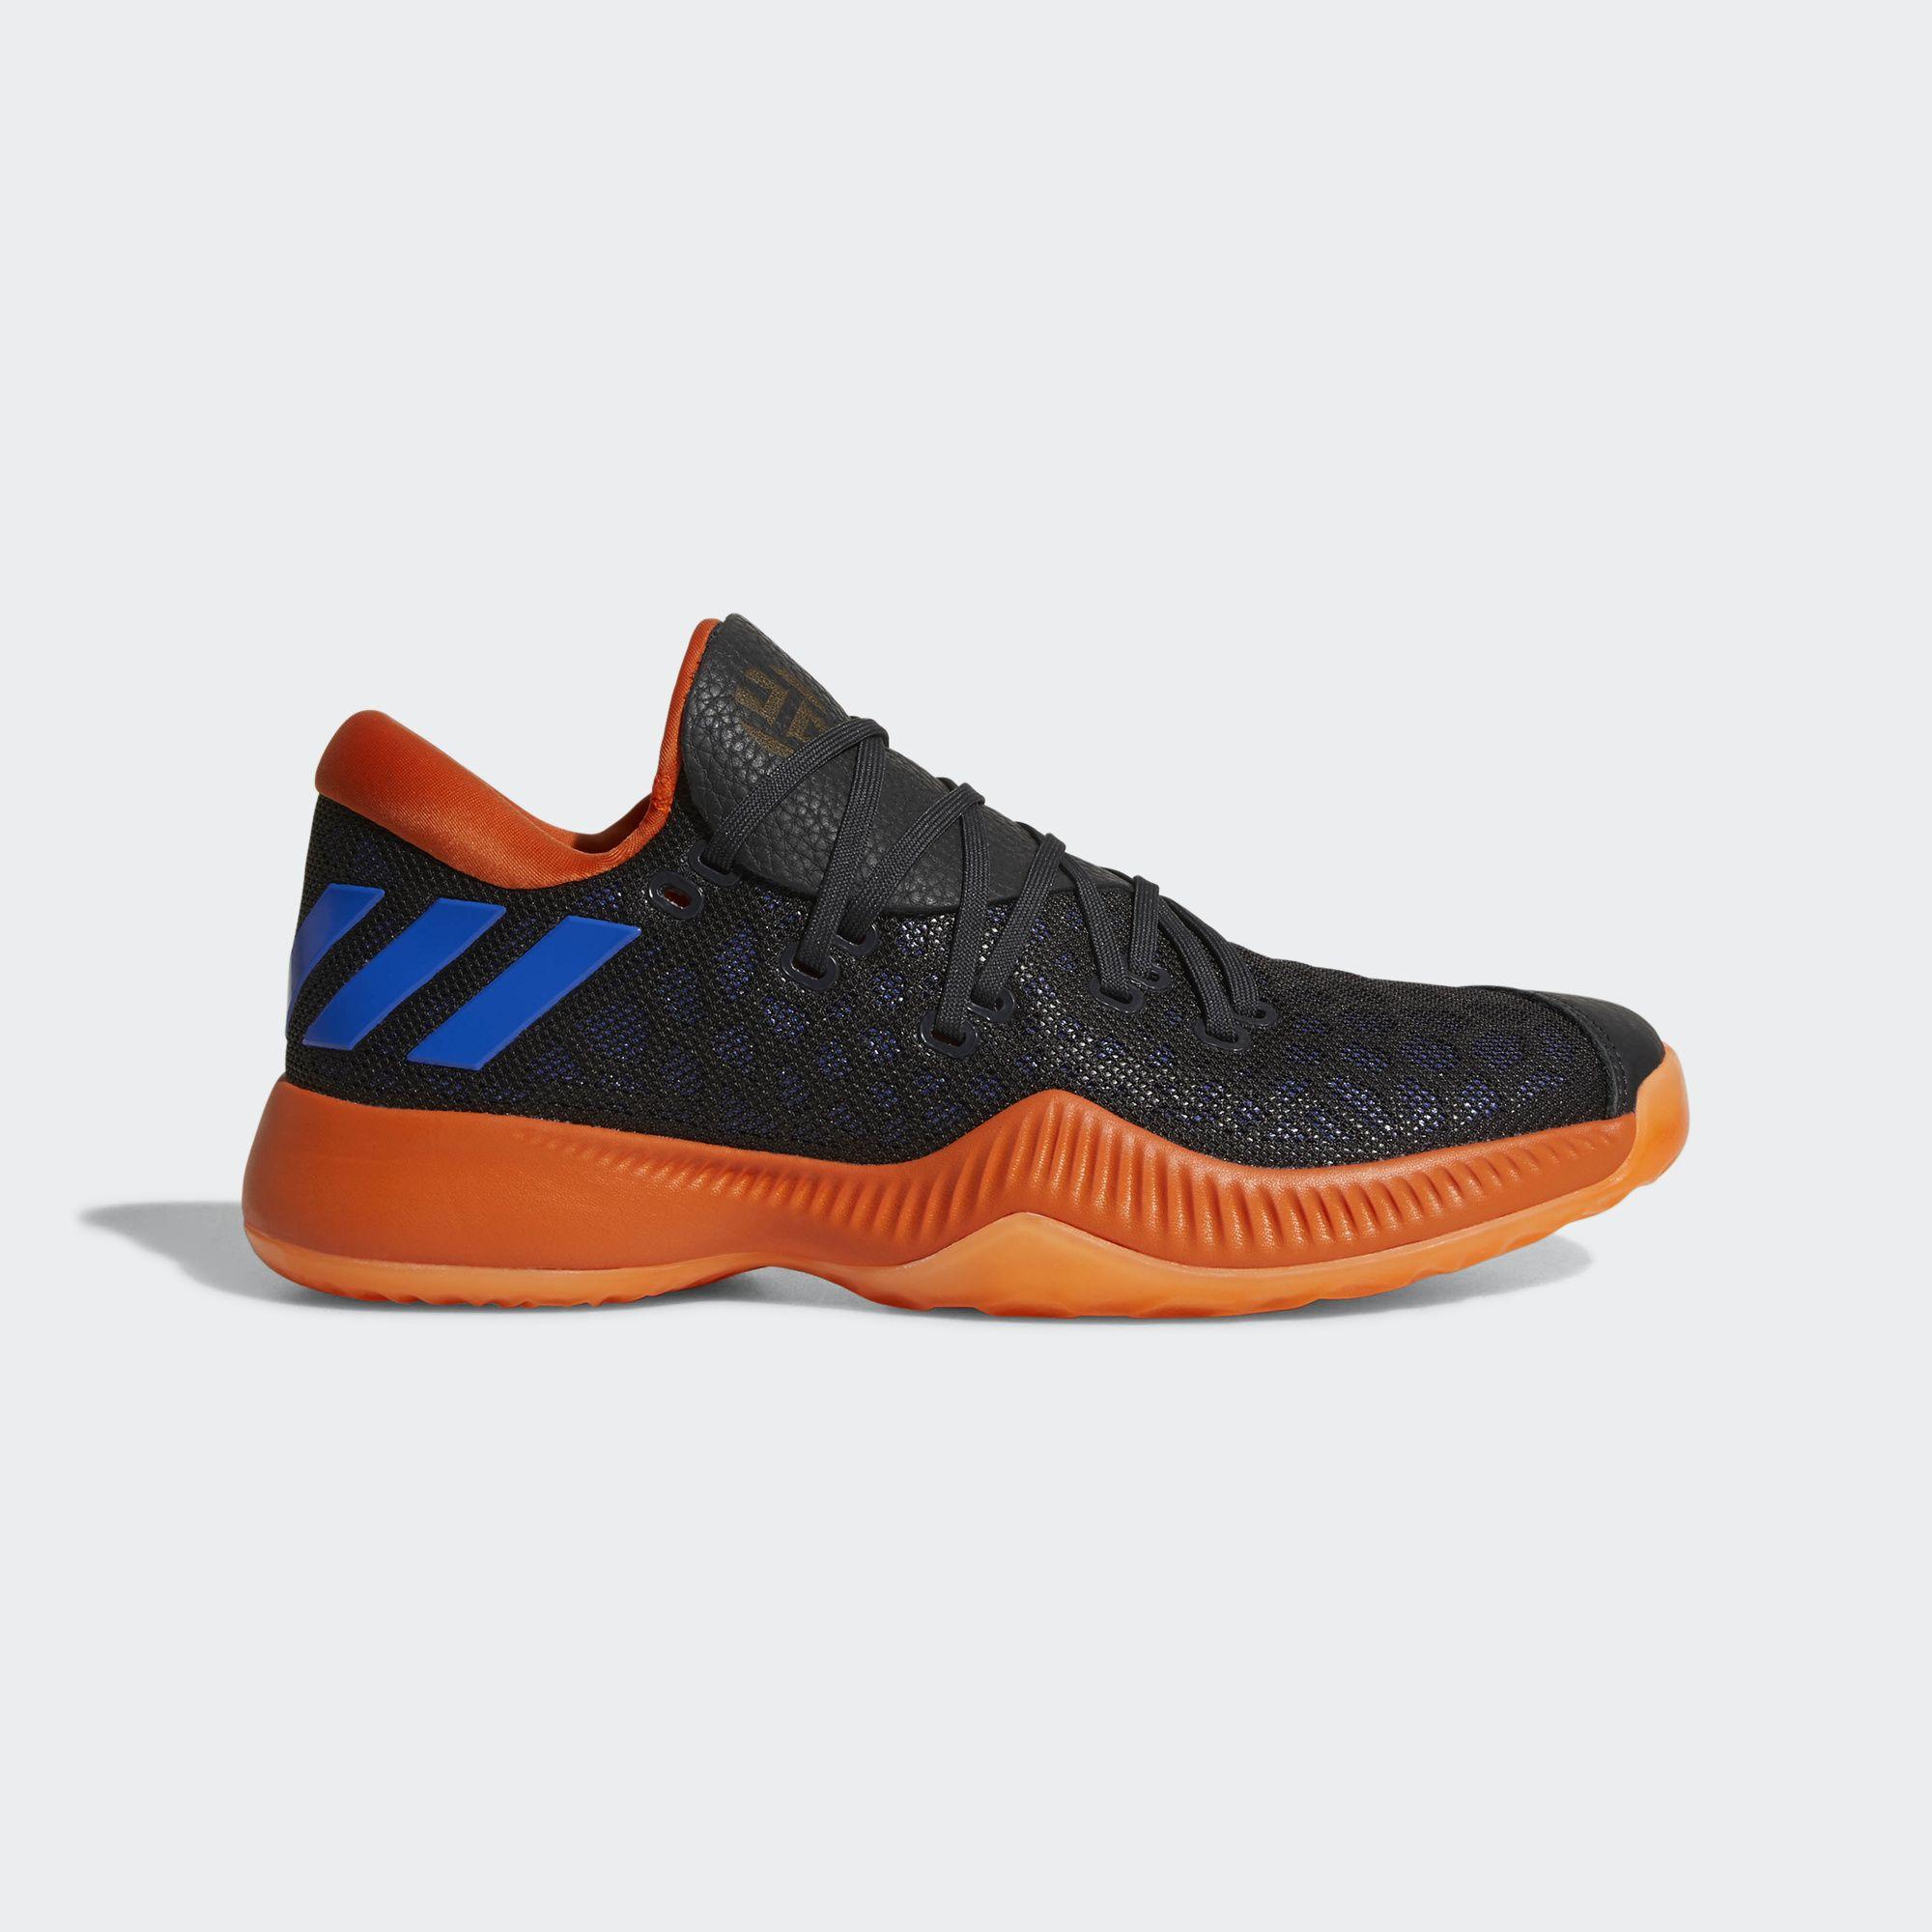 06a0167fa14 2 james red black shoes 511ae a3508  germany adidas harden b e black orange  blue 3 cdf47 dc265